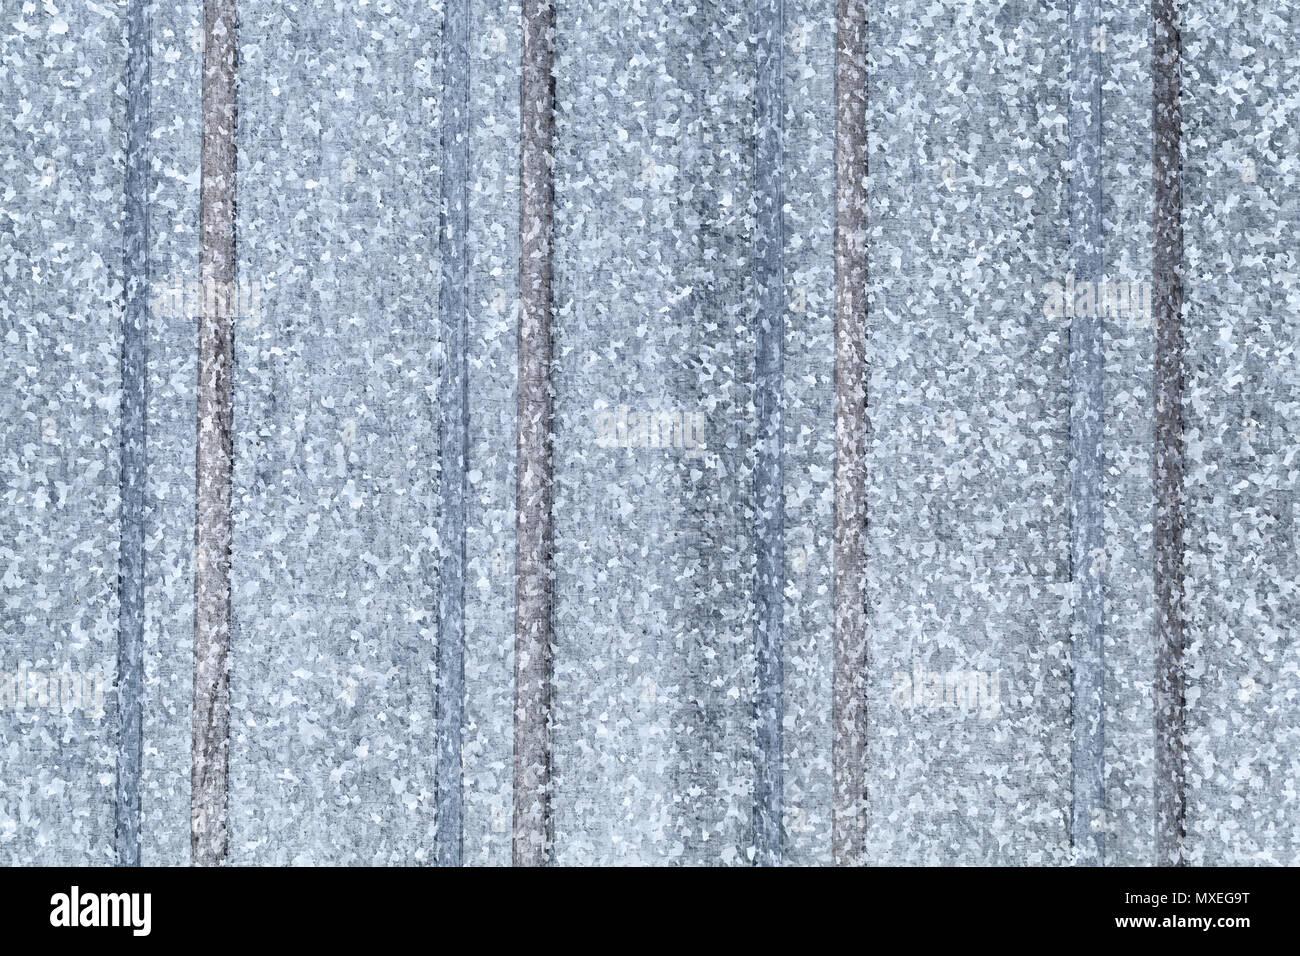 Gray galvanized ridged steel sheet, flat background photo texture - Stock Image